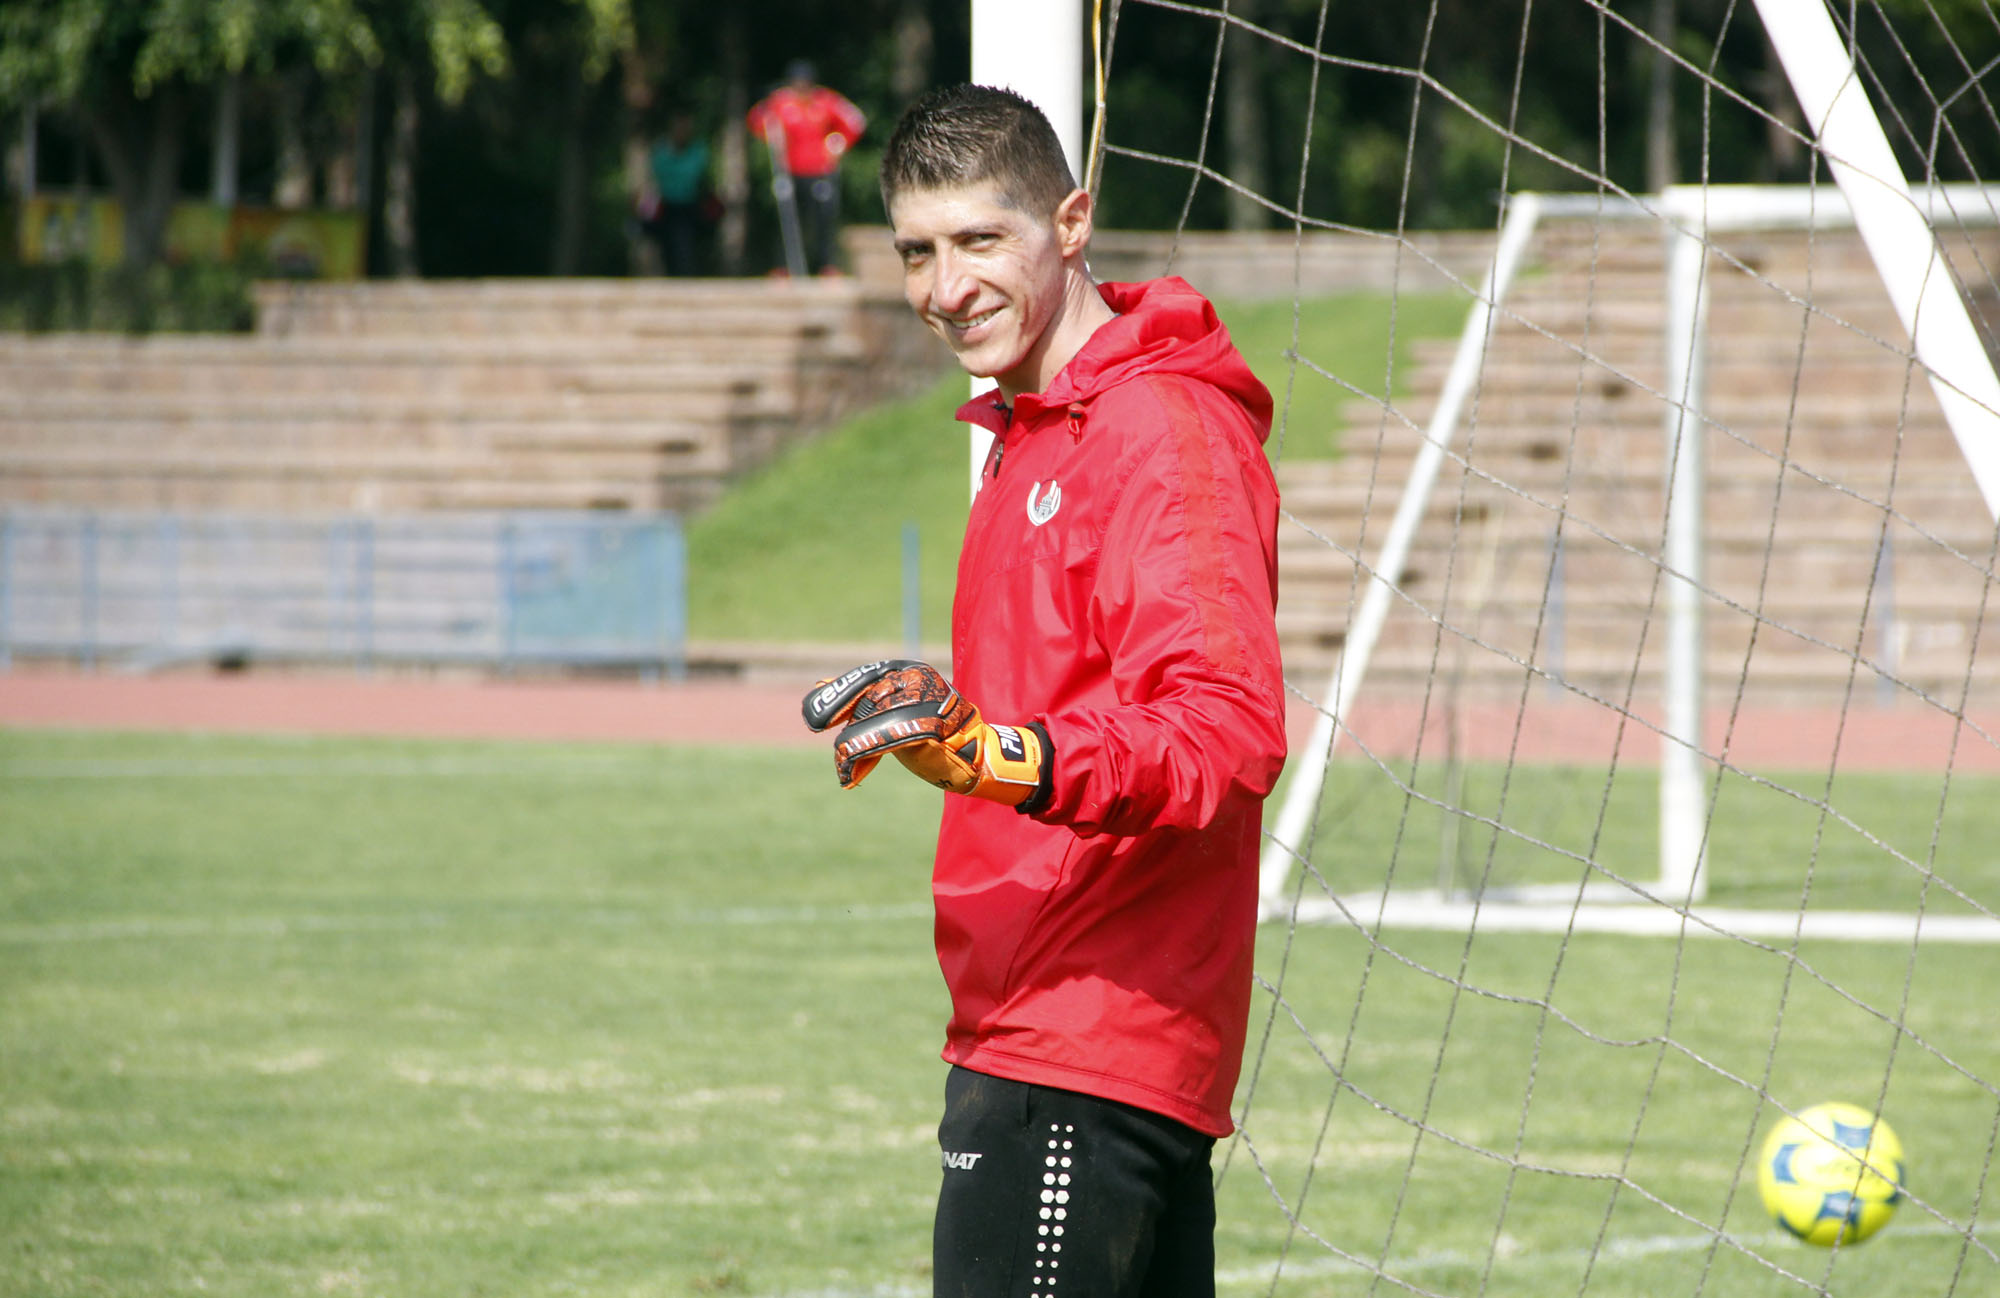 Alejandro Palacios, Pikolín, Once ideal, Ascenso MX, Jornada 6, portero, Atlético de San Luis